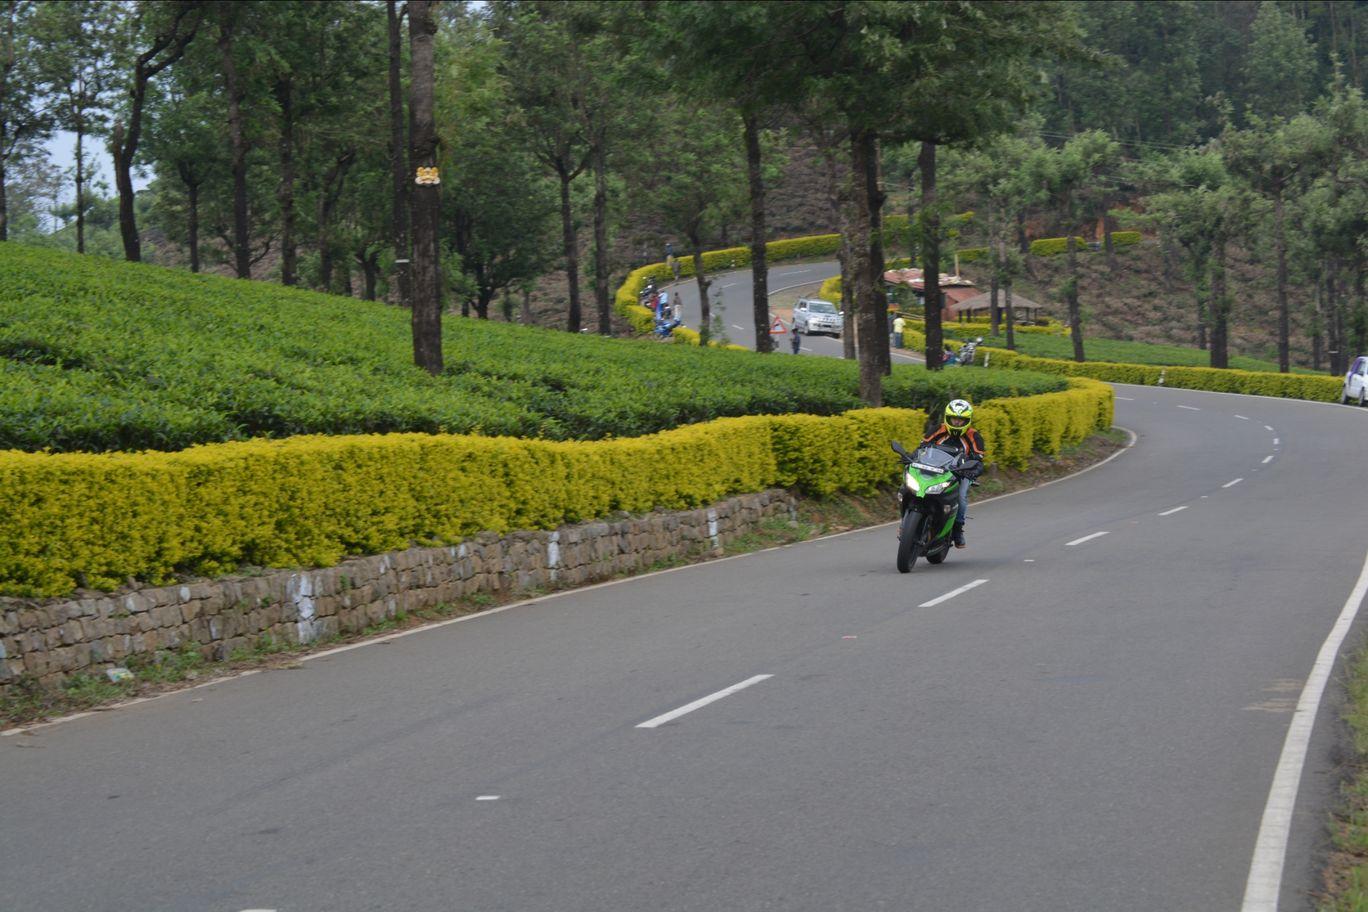 Photo of Valparai By Akhil Krishnan